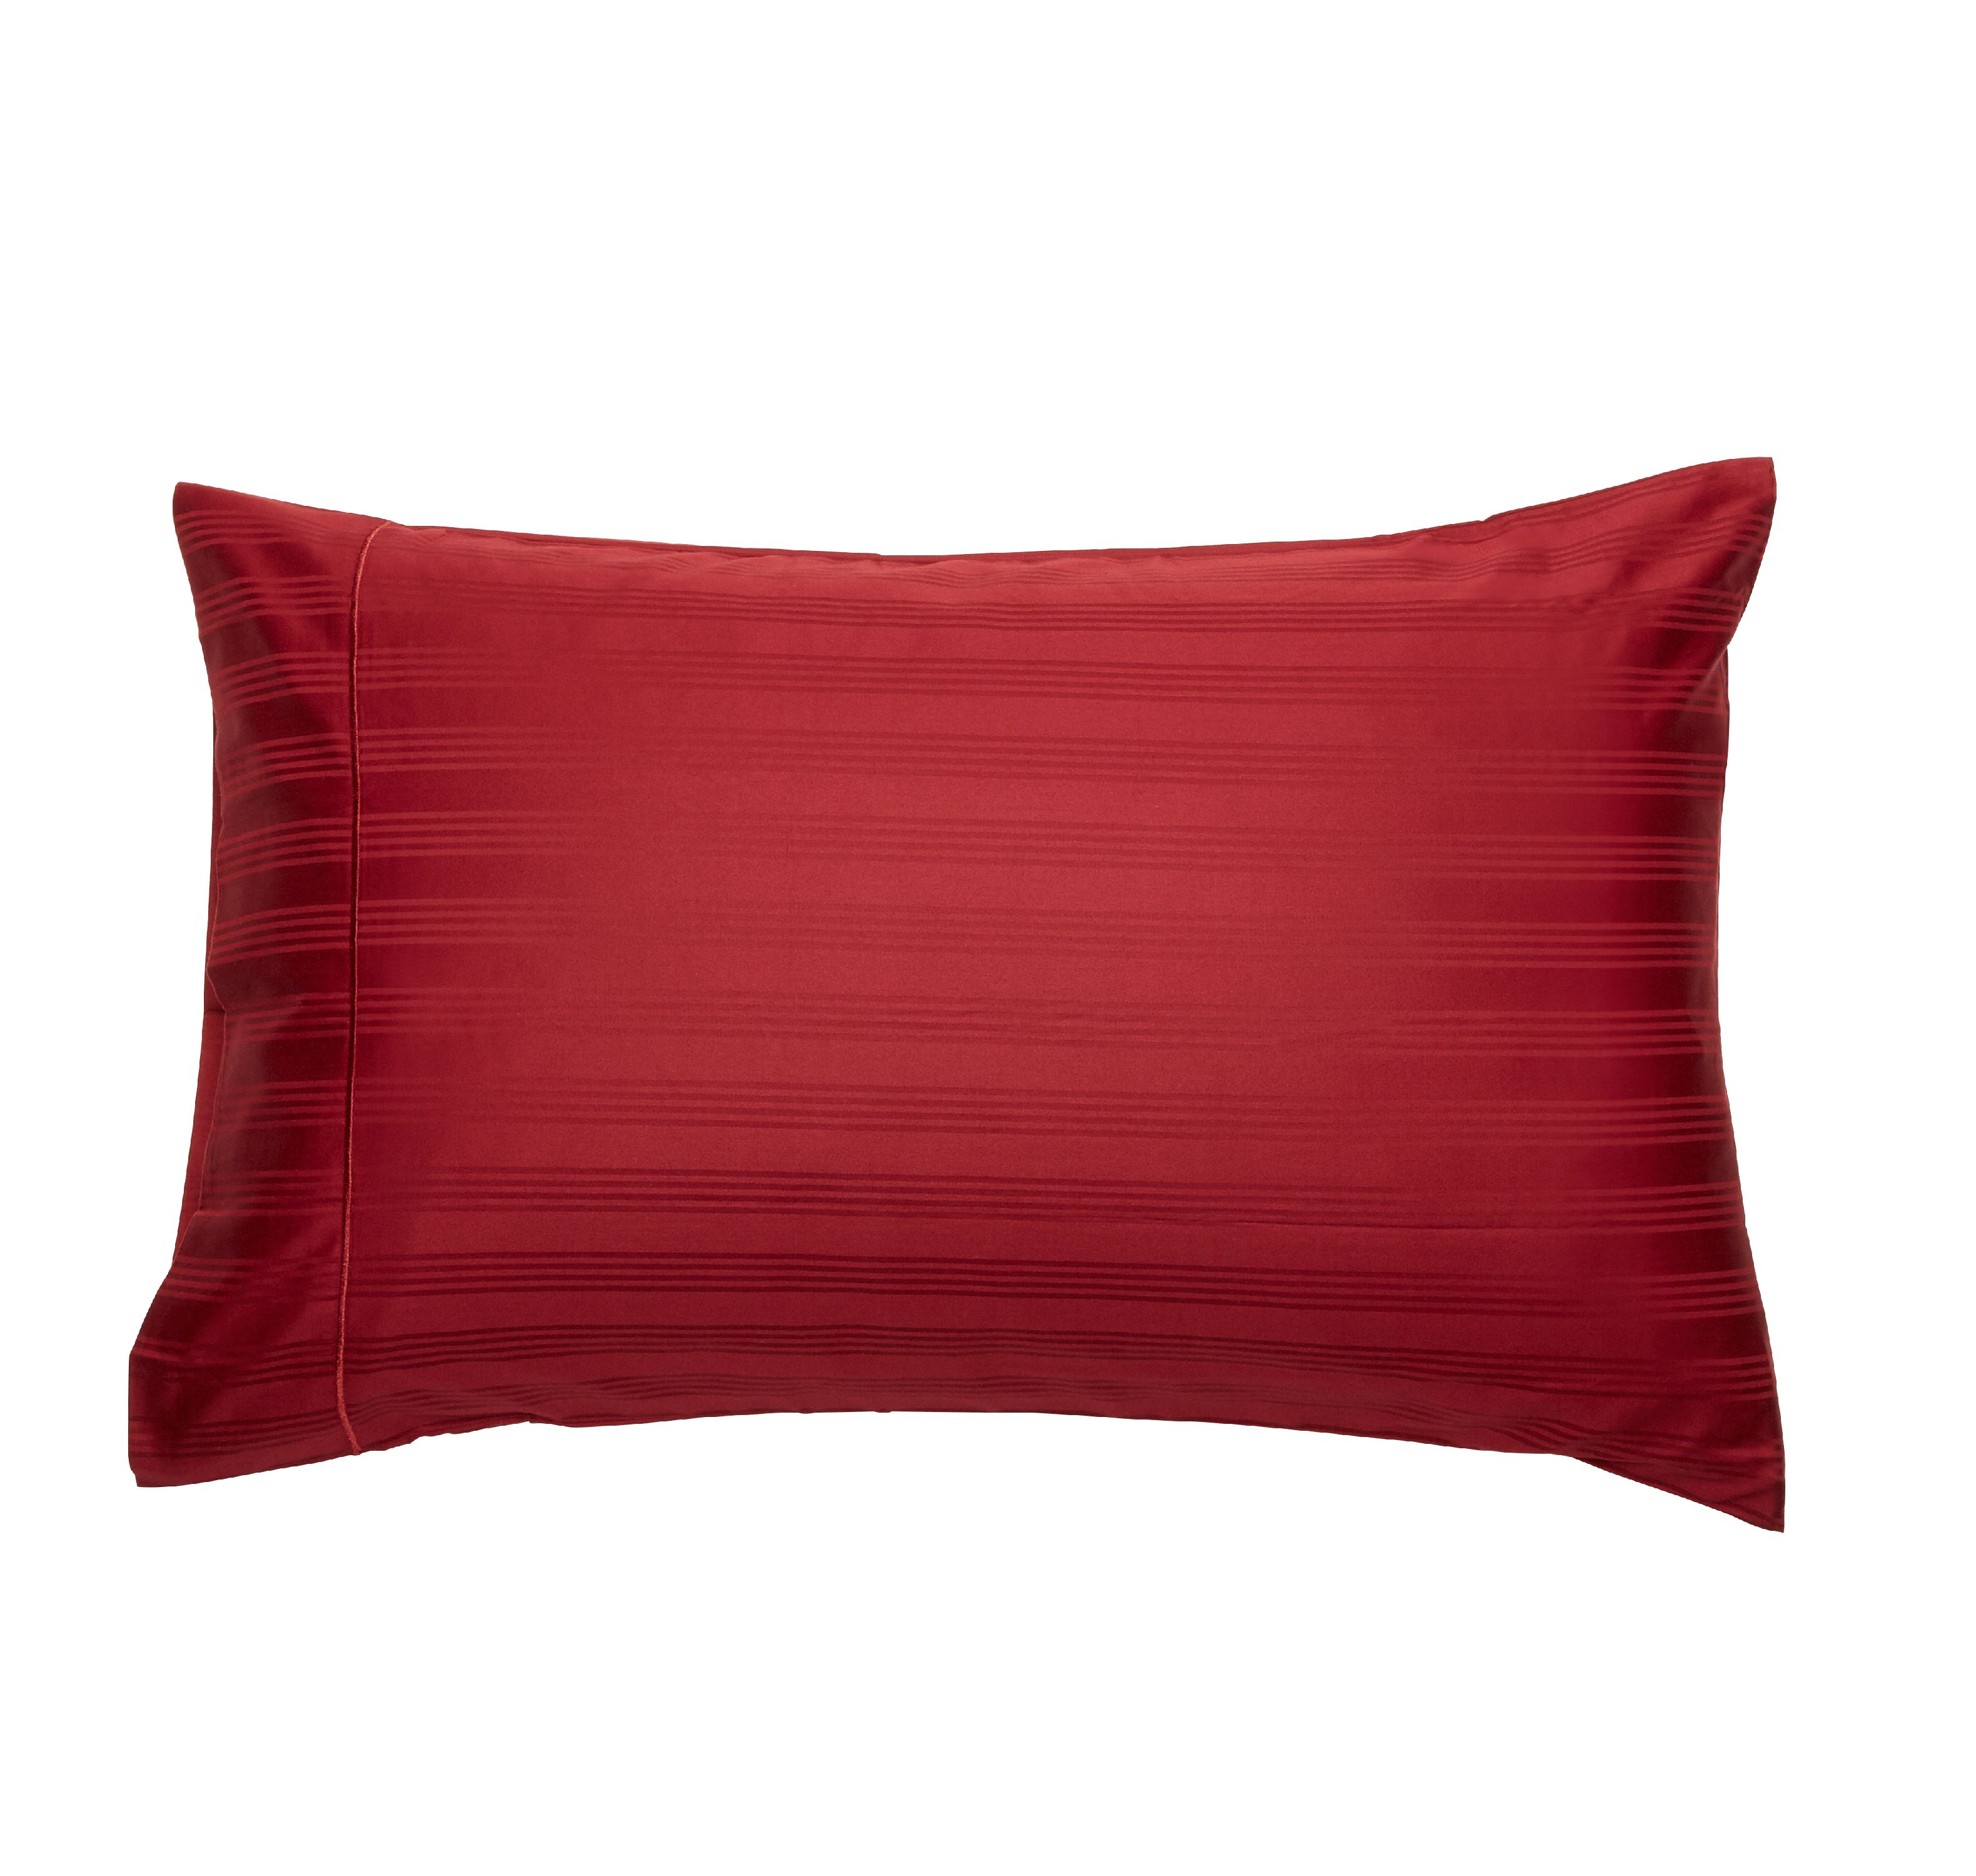 Better Homes and Gardens Polka Dot Pillowcase Set size Standard Queen /& King